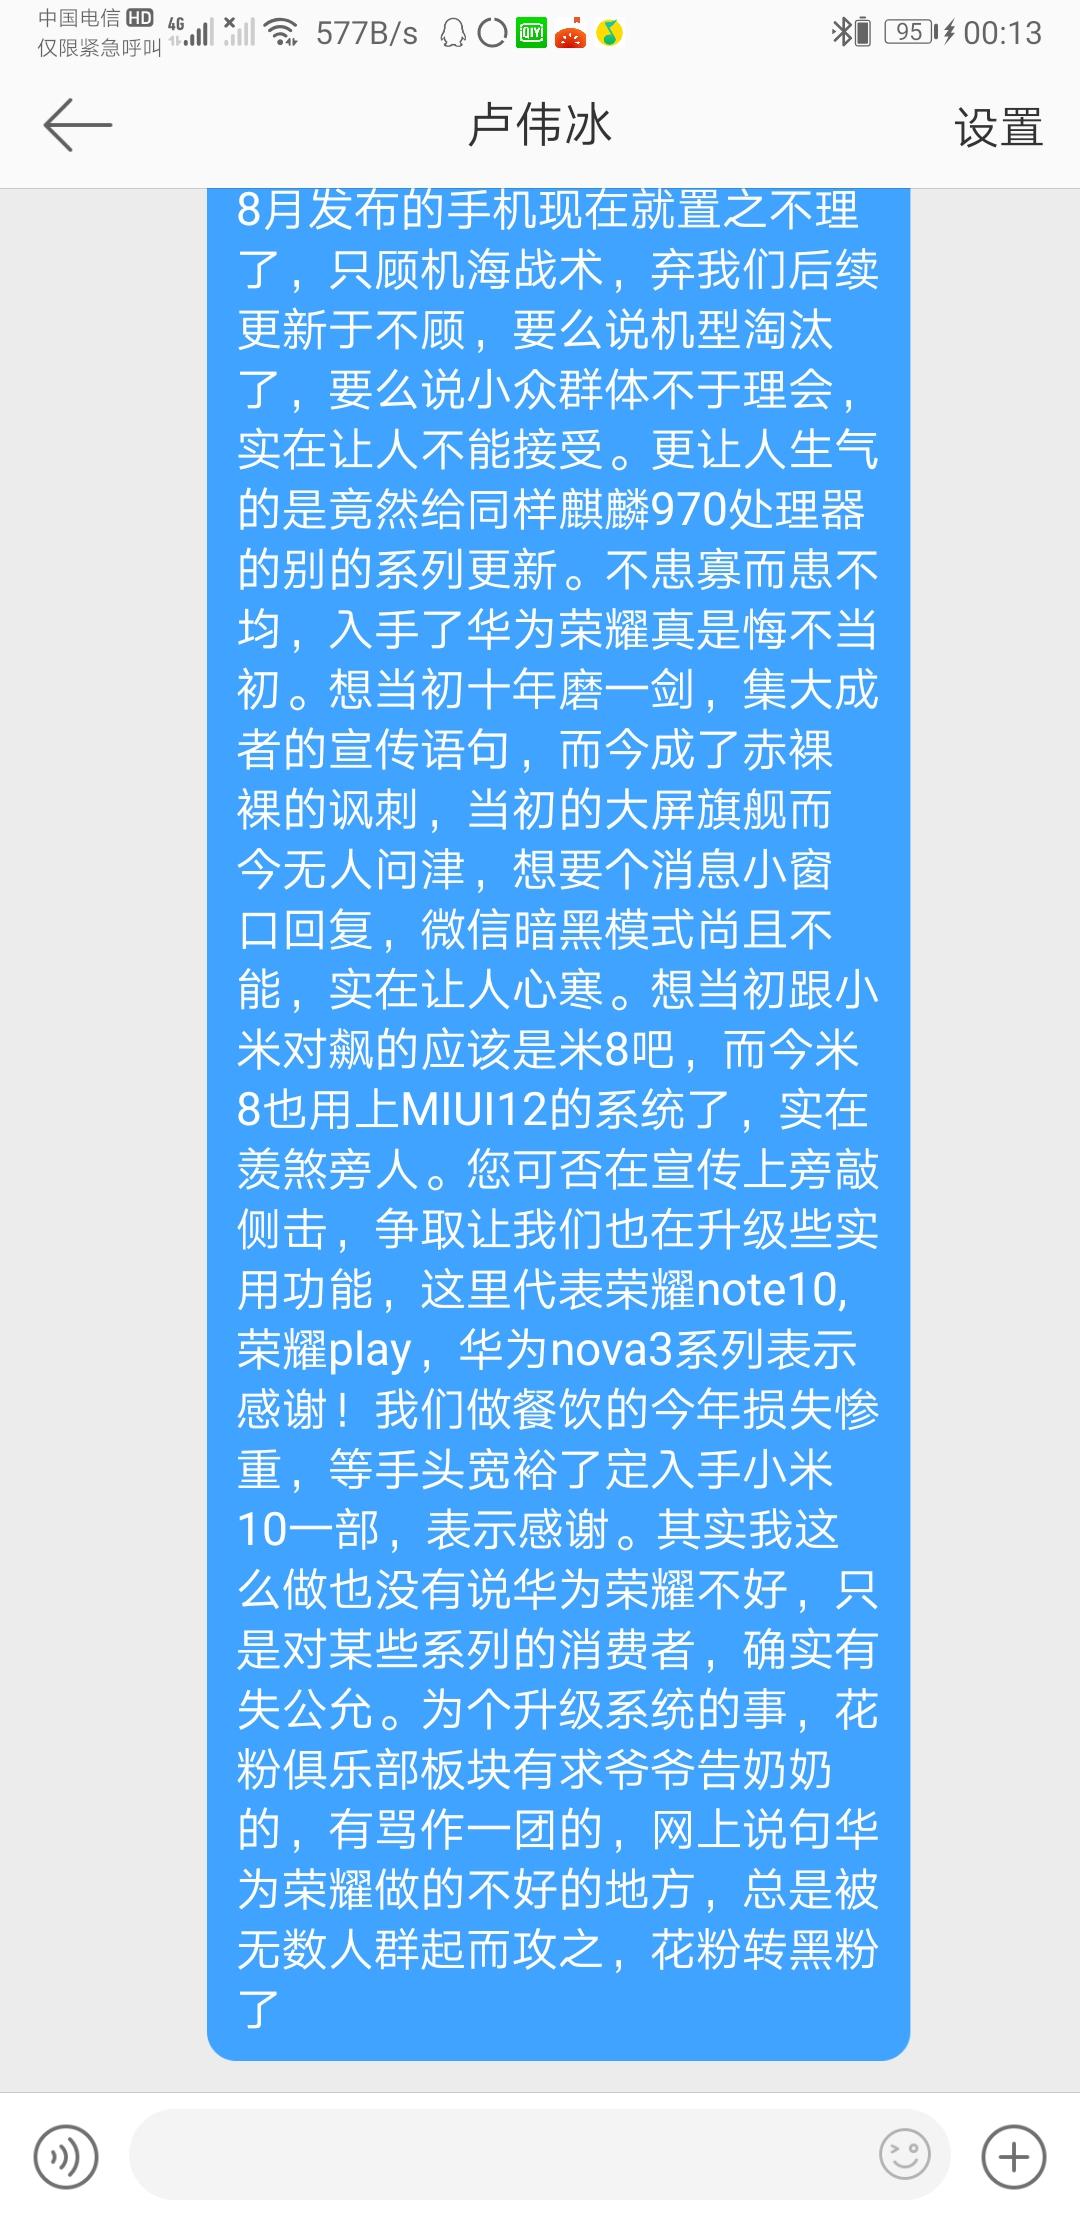 Screenshot_20200516_001329_com.sina.weibo.jpg